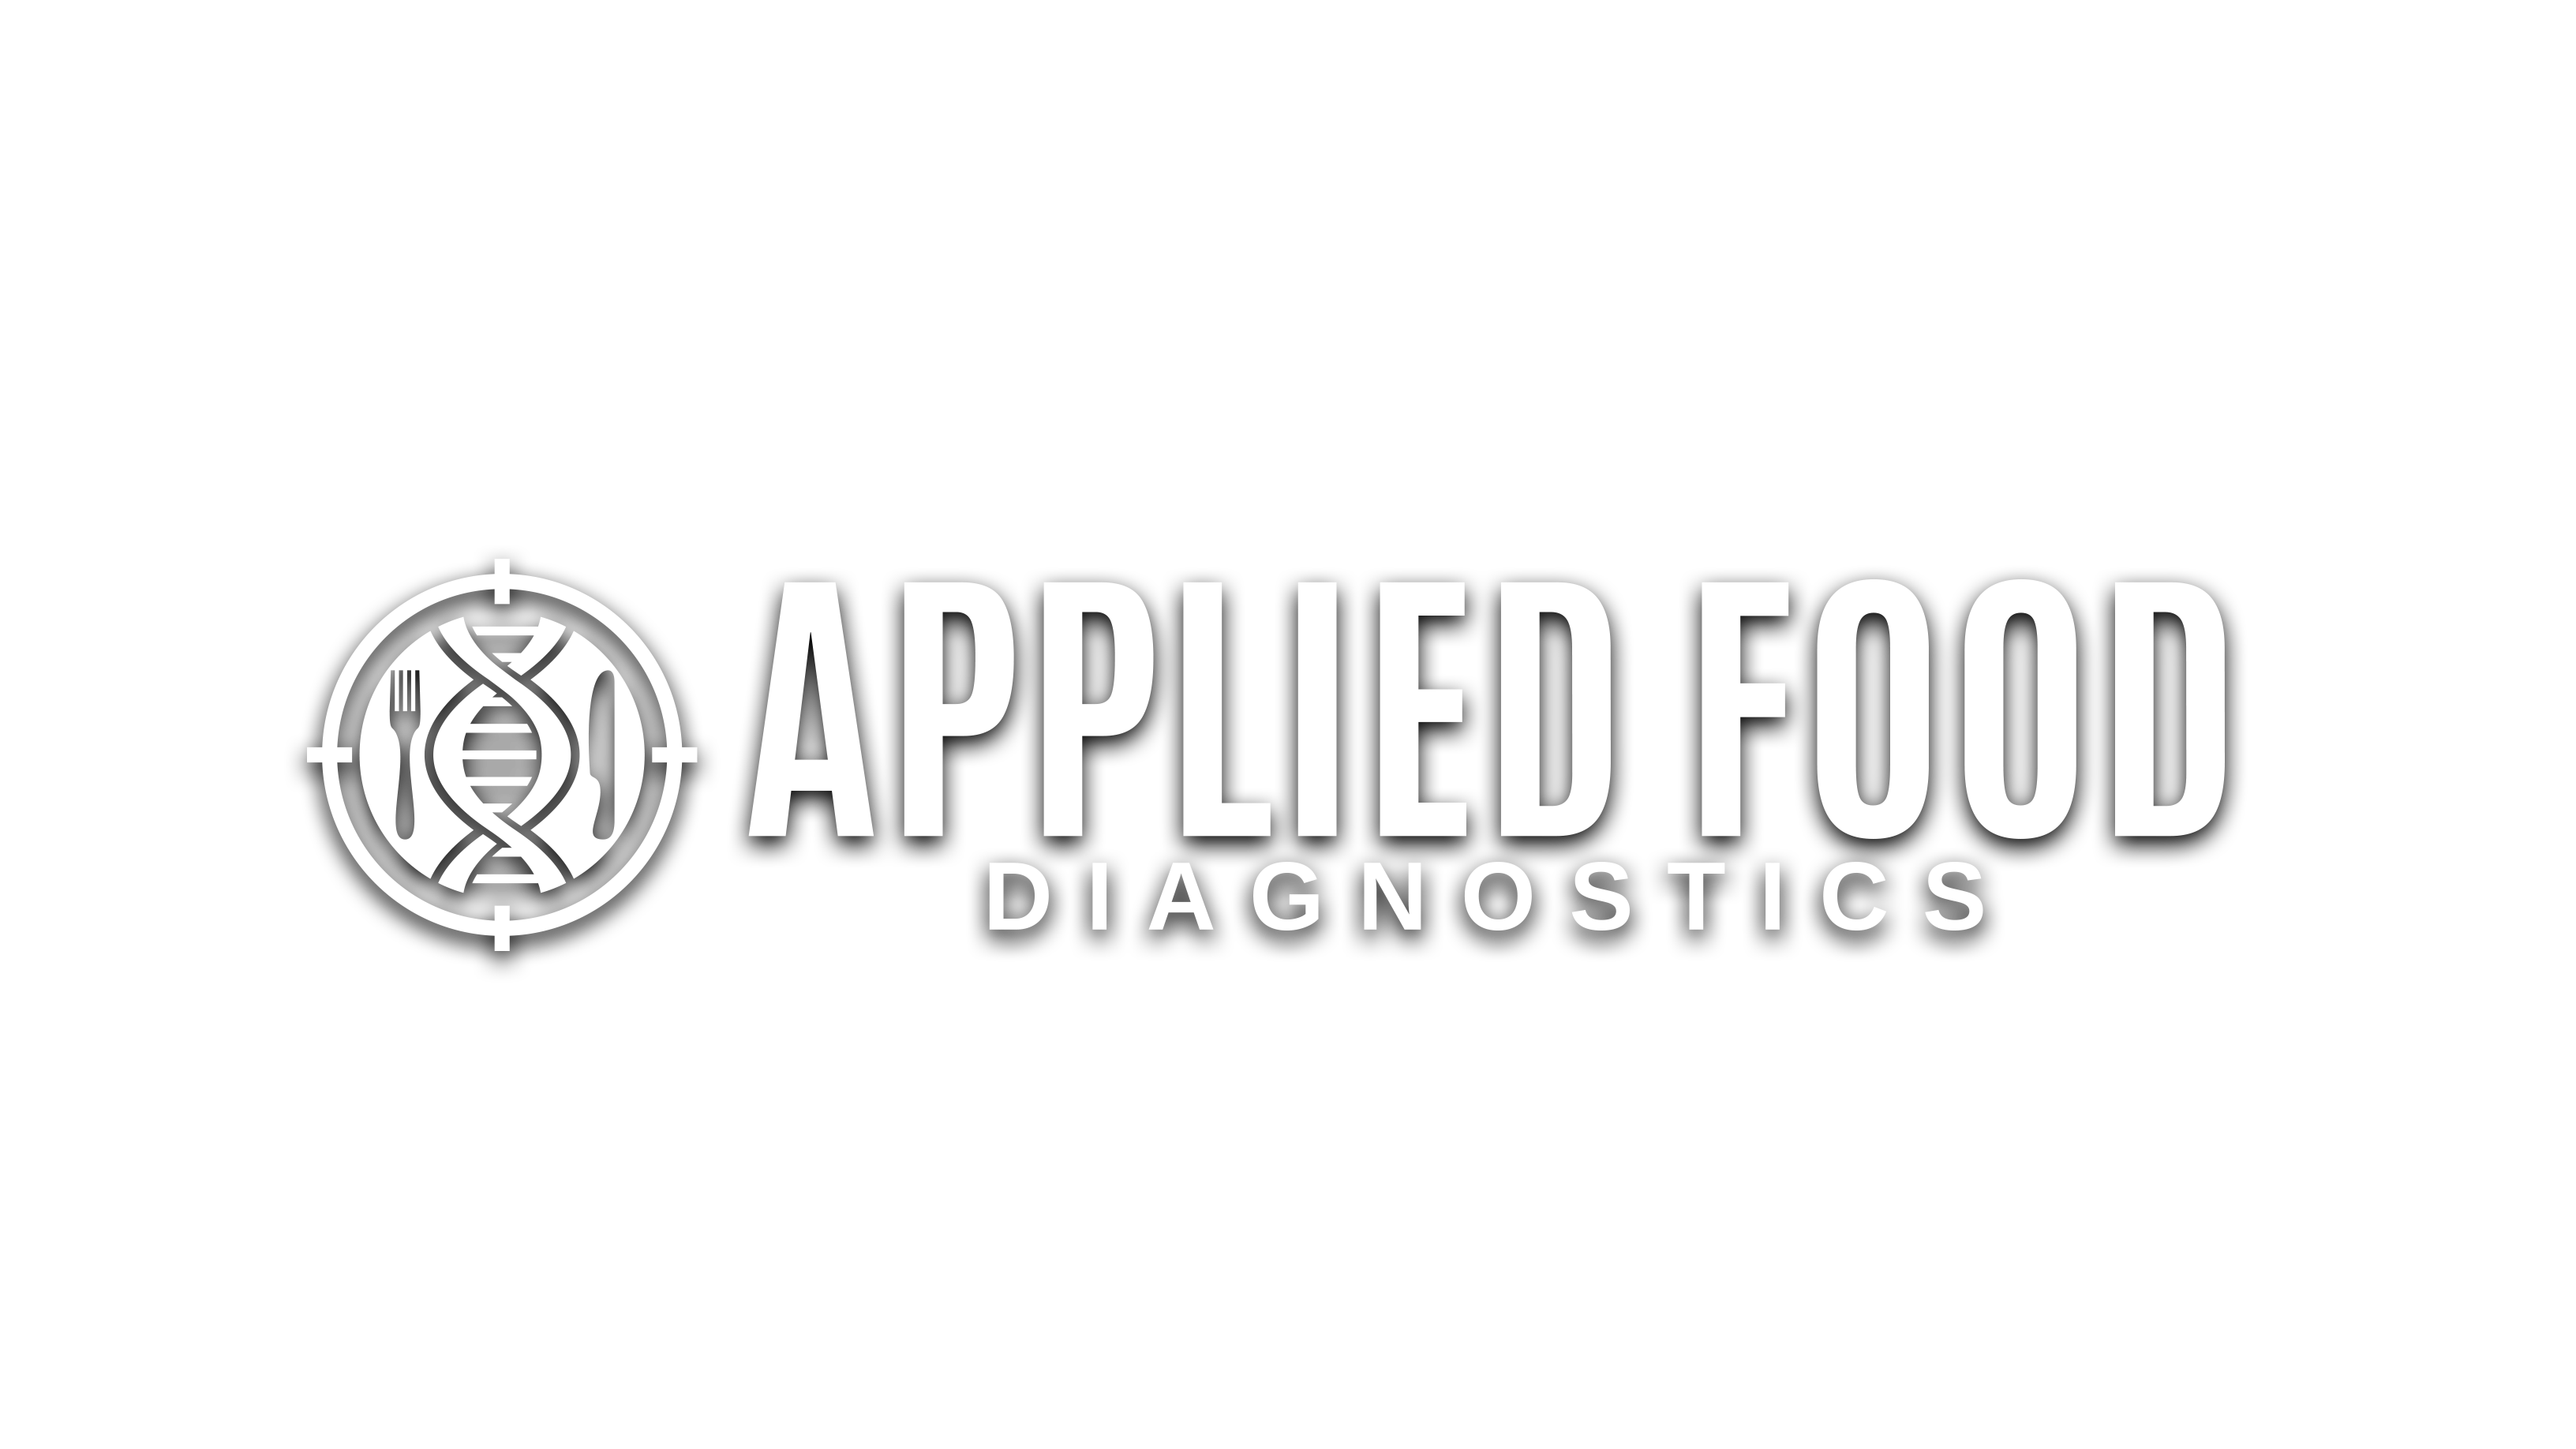 Applied Food Diagnostics Logo